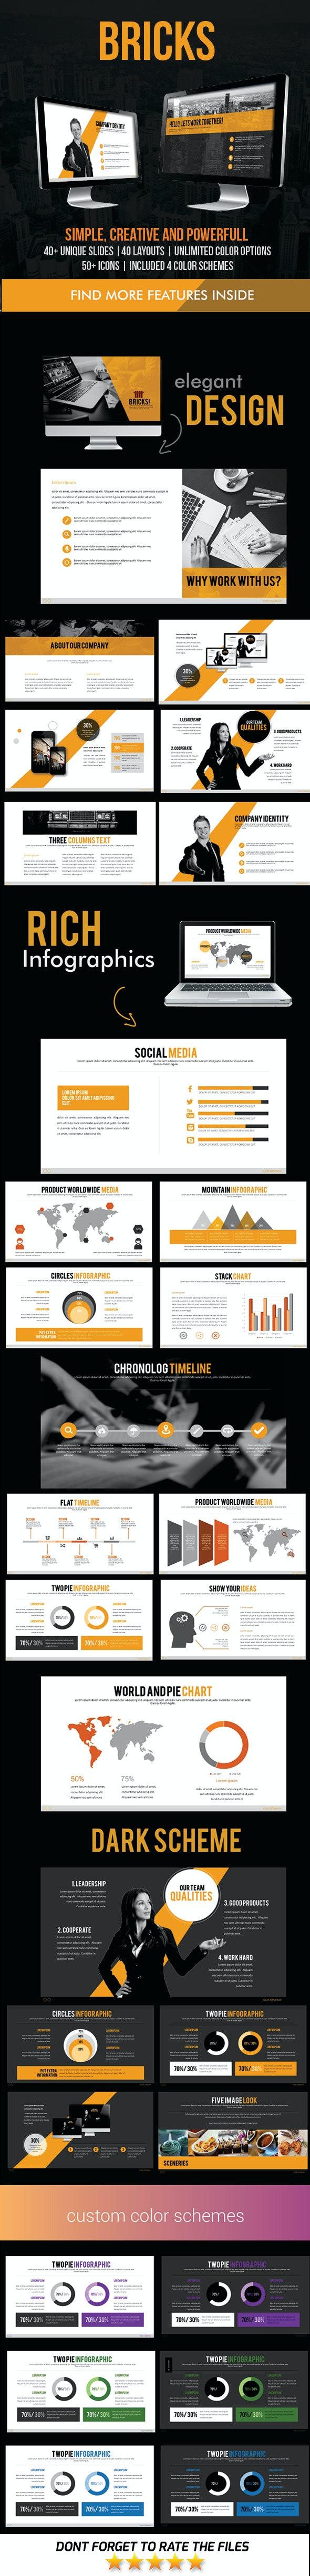 Bricks PowerPoint Template - Business PowerPoint Templates